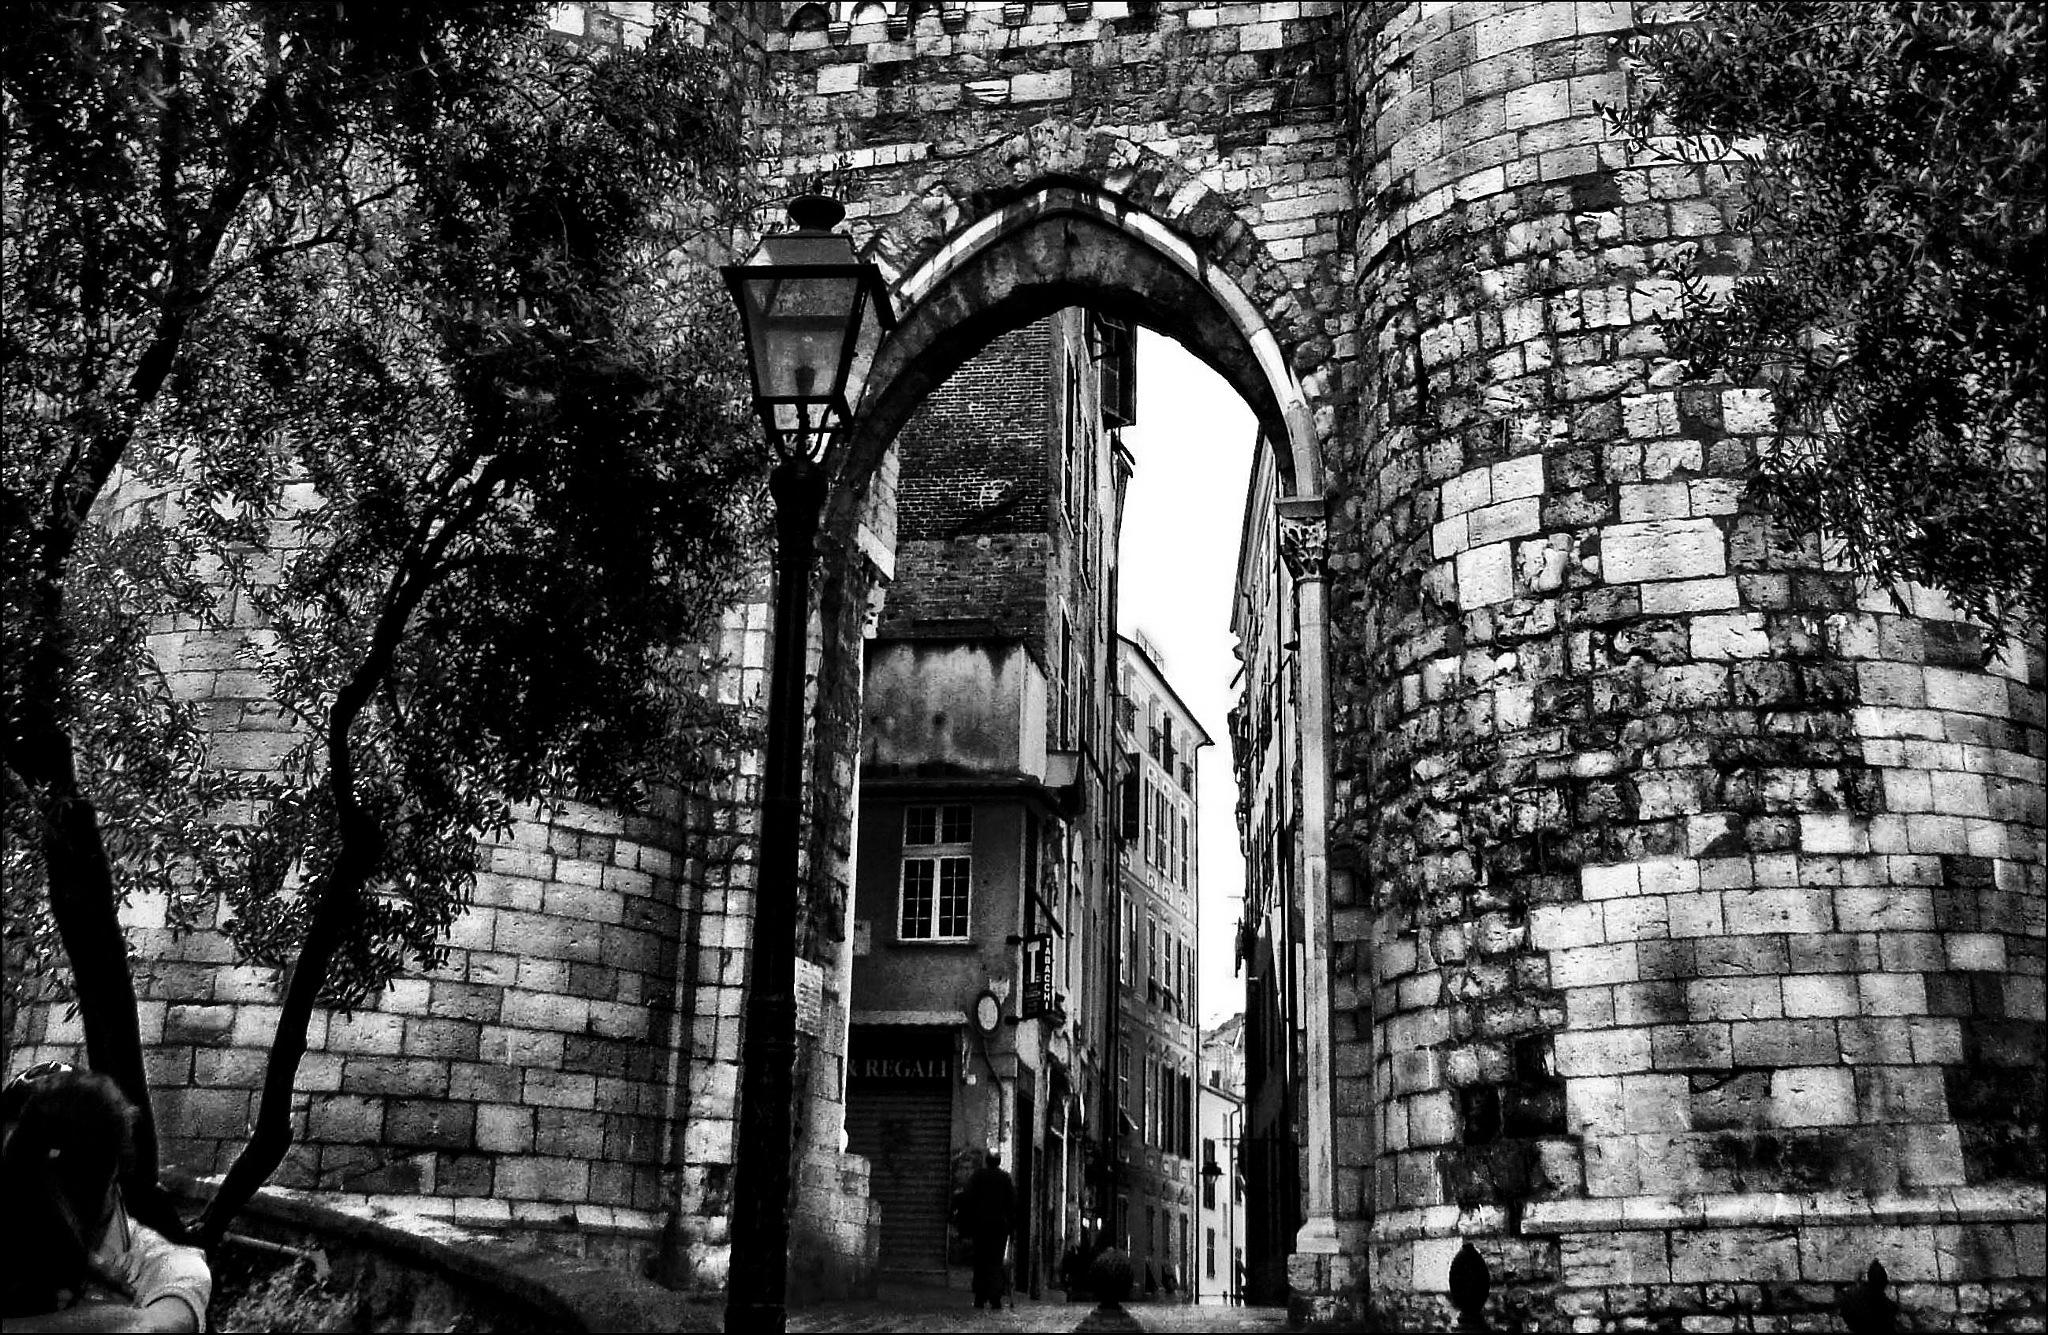 Porta de Sant'Andrea [Porta Soprana] by Fred Matos